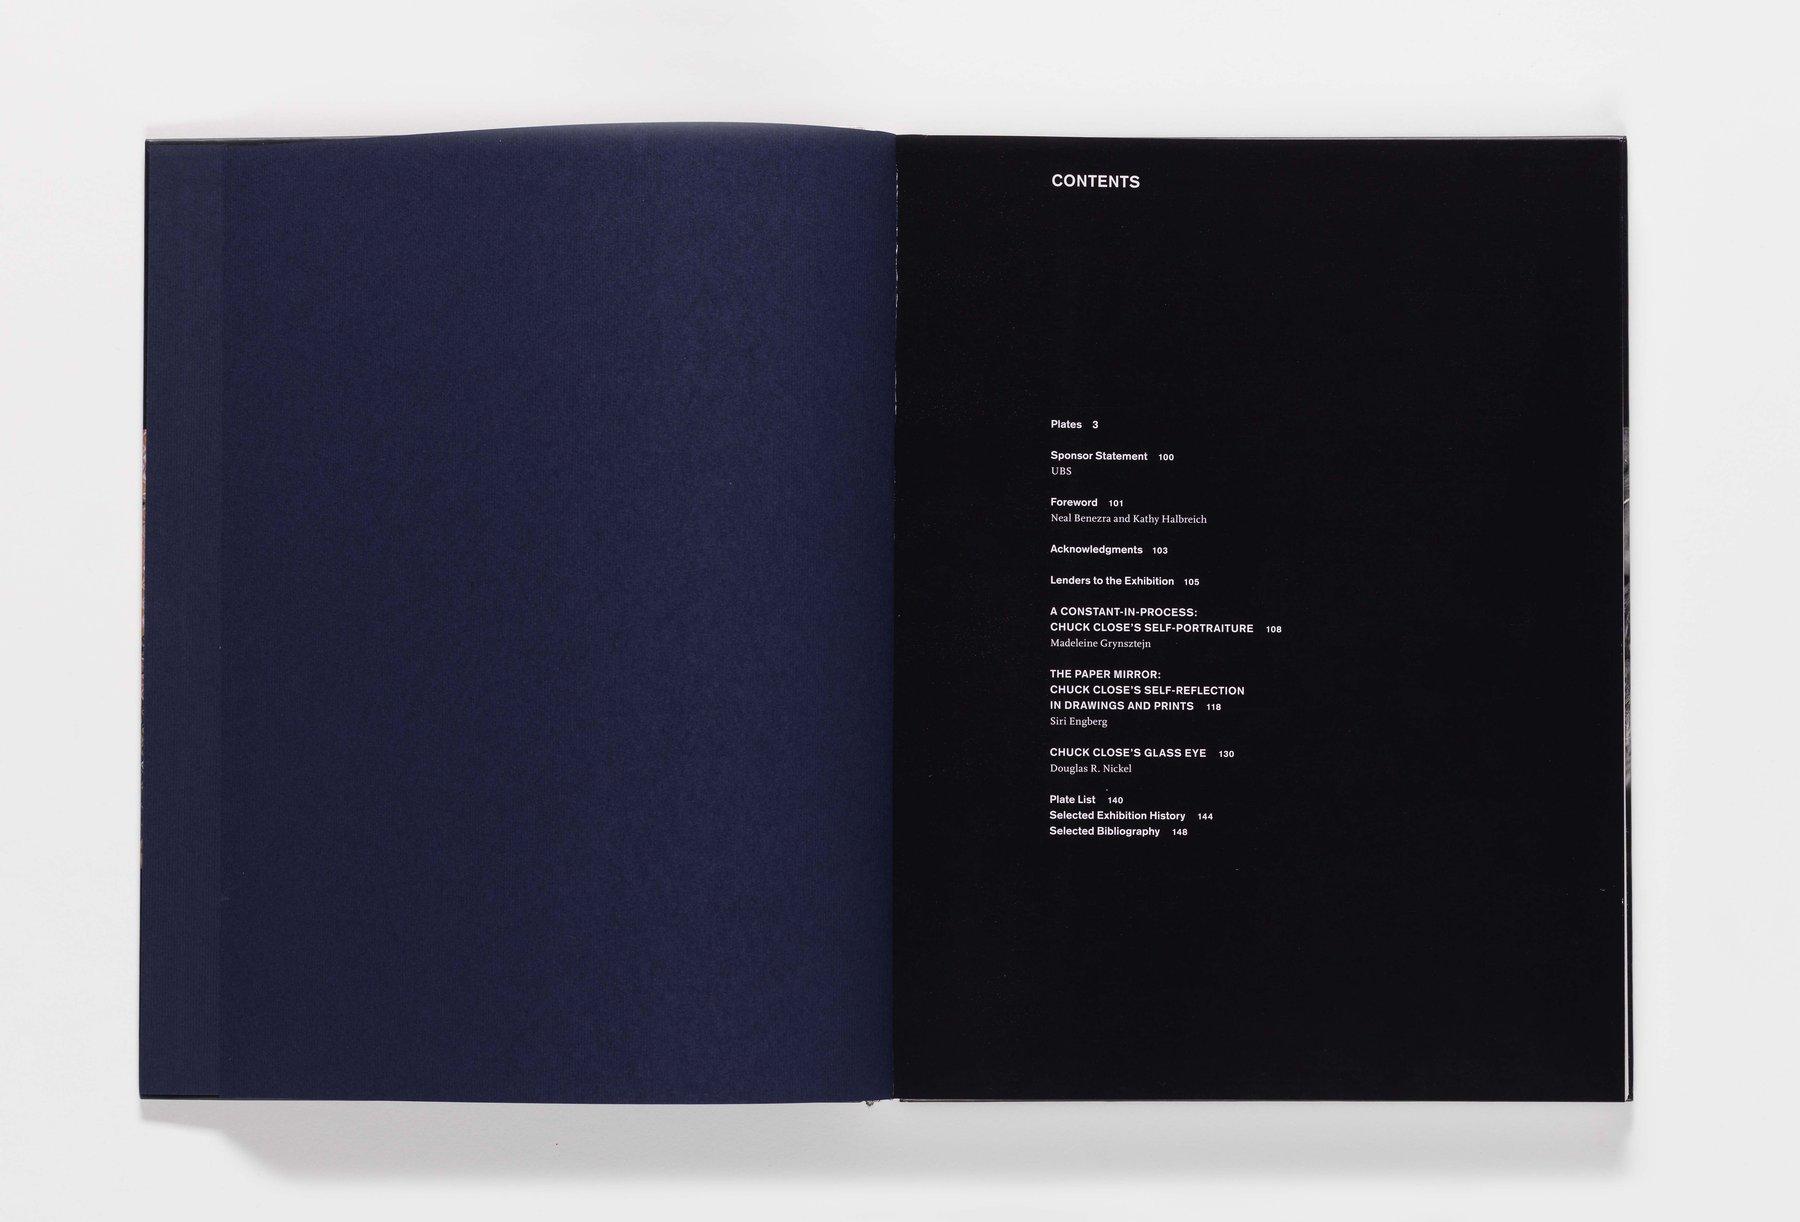 Chuck Close Self-Portraits publication table of contents